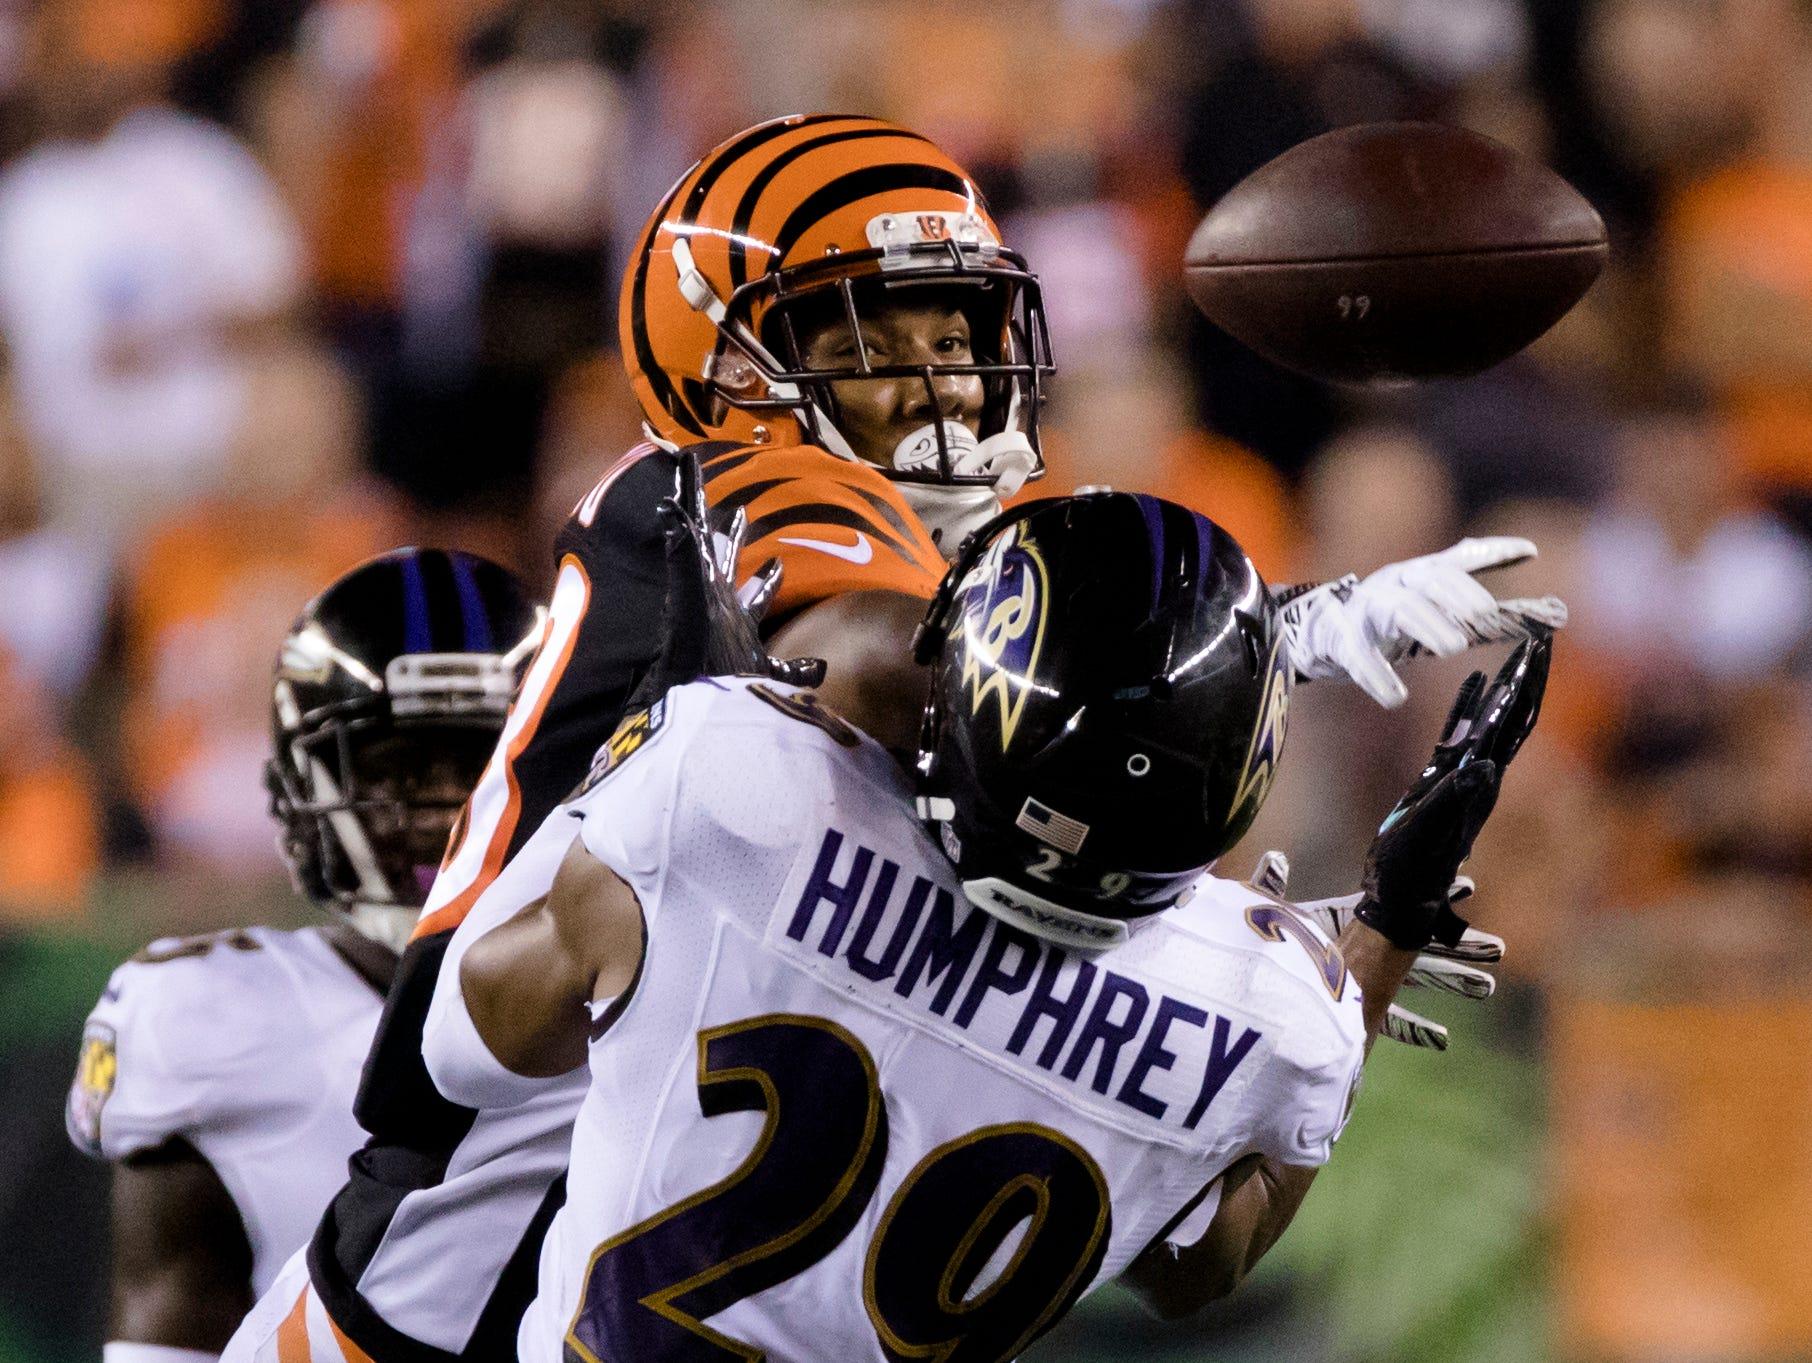 Cincinnati Bengals wide receiver Tyler Boyd (83) swats a pass away from Baltimore Ravens cornerback Marlon Humphrey (29) during the Week 2 NFL game between the Cincinnati Bengals and the Baltimore Ravens, Thursday, Sept. 13, 2018, at Paul Brown Stadium in Cincinnati.